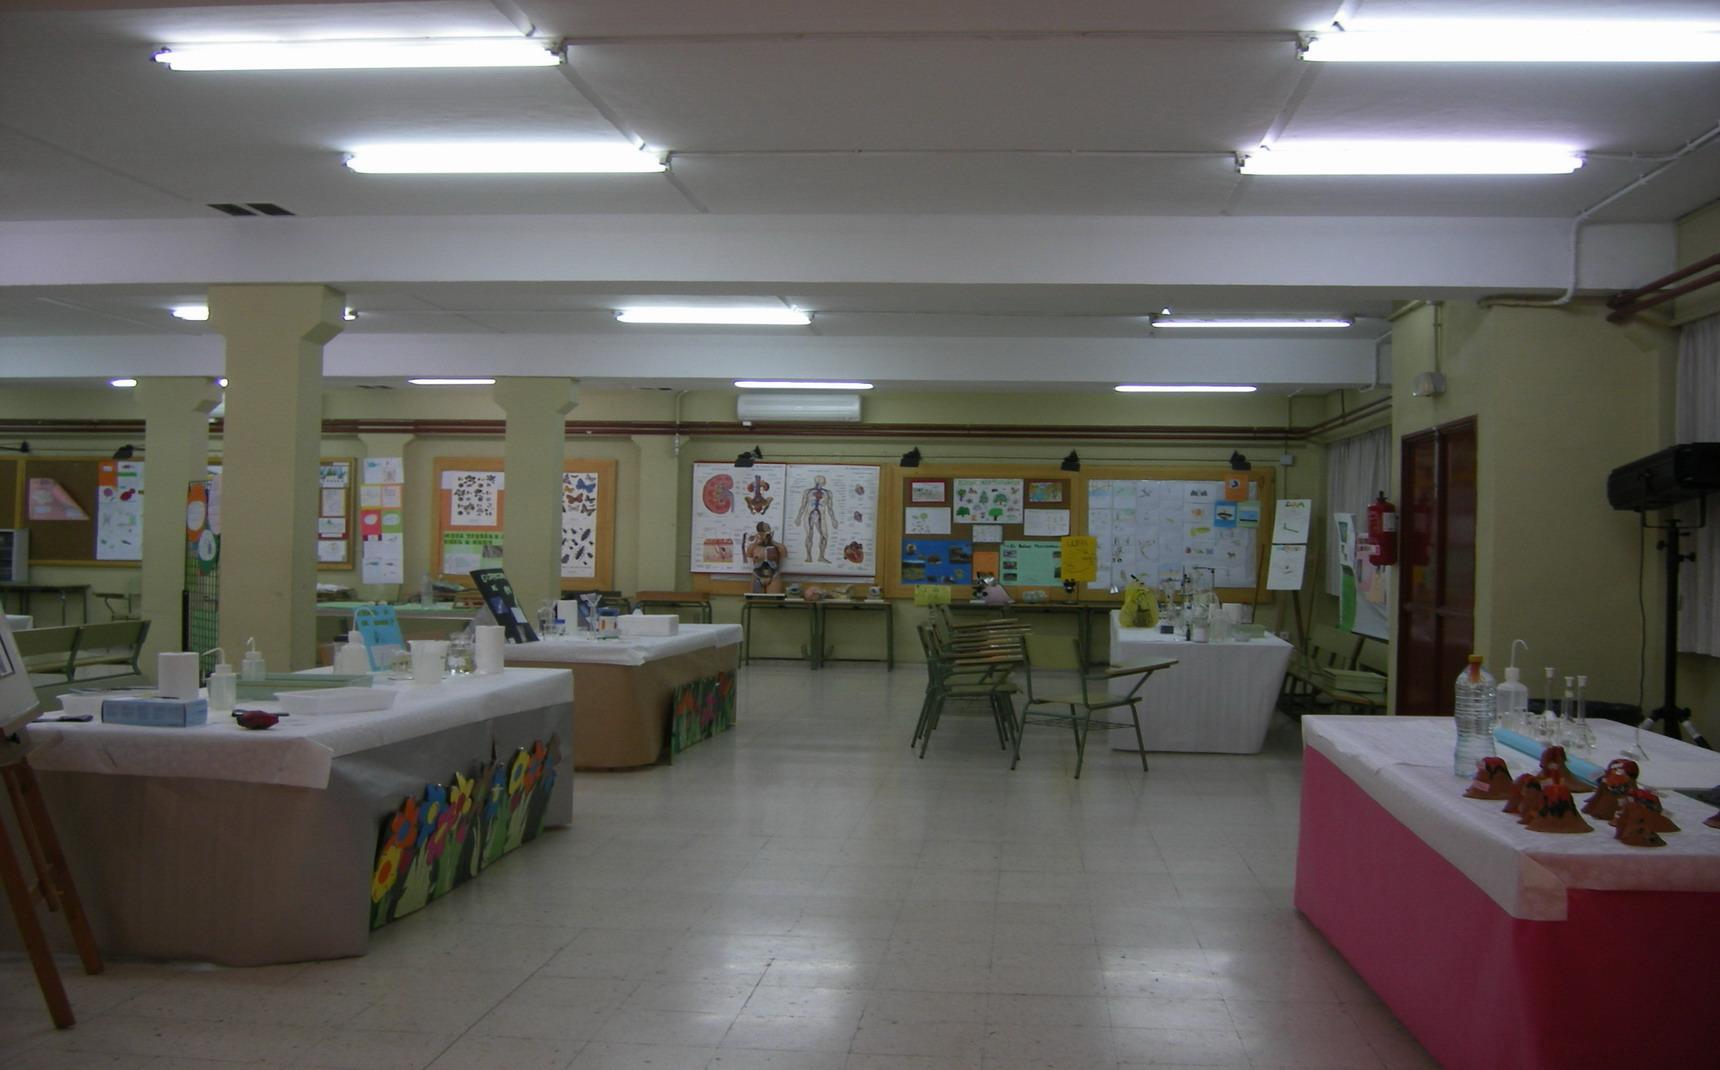 Vista parcial del Salón de Usos Múltiples del IES Blas Infante